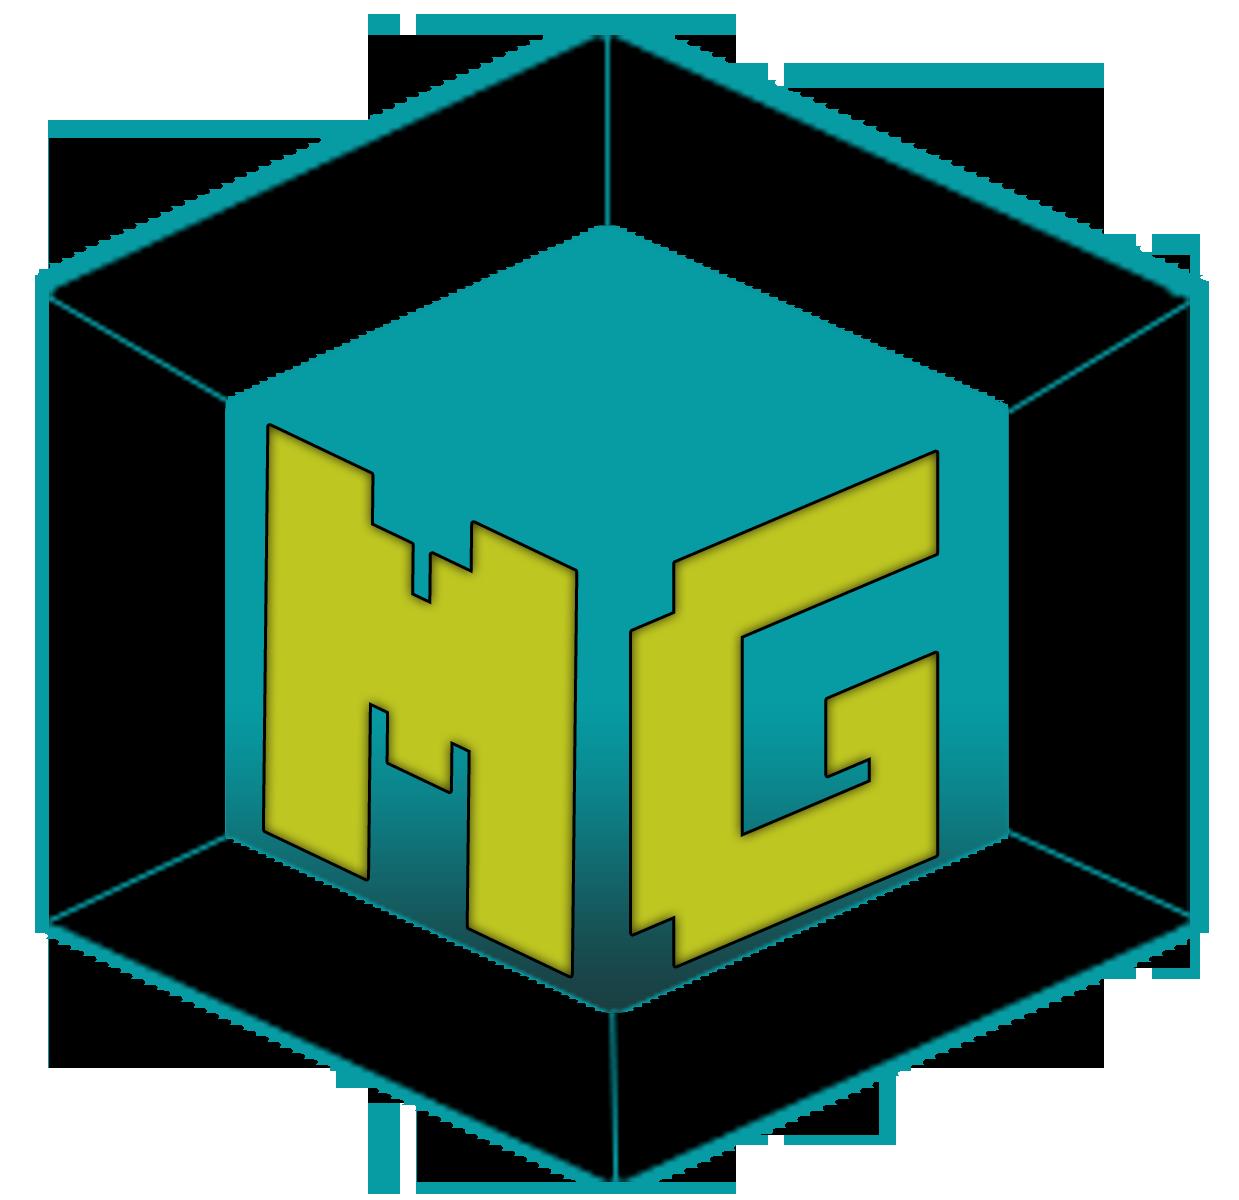 Club clipart fun game Maine Video GameMaine The News